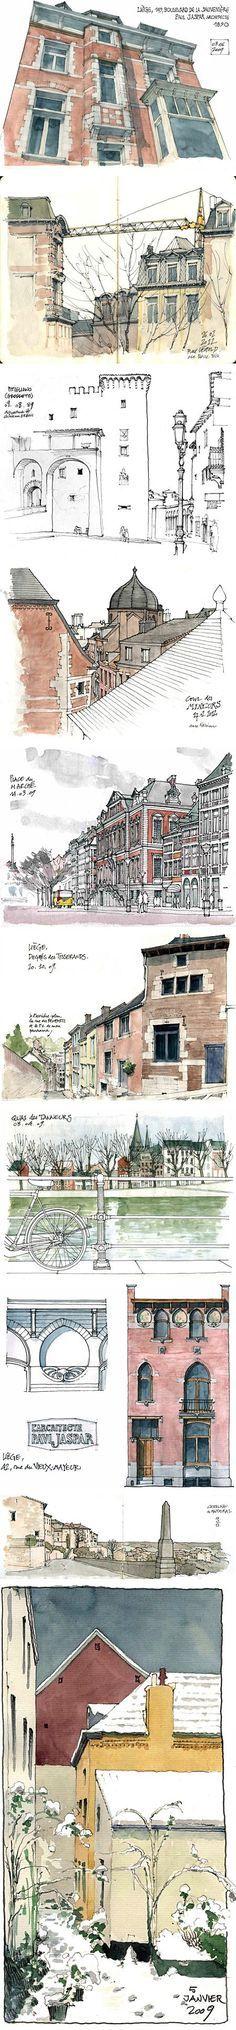 paisajes urbanos Gérard Michel